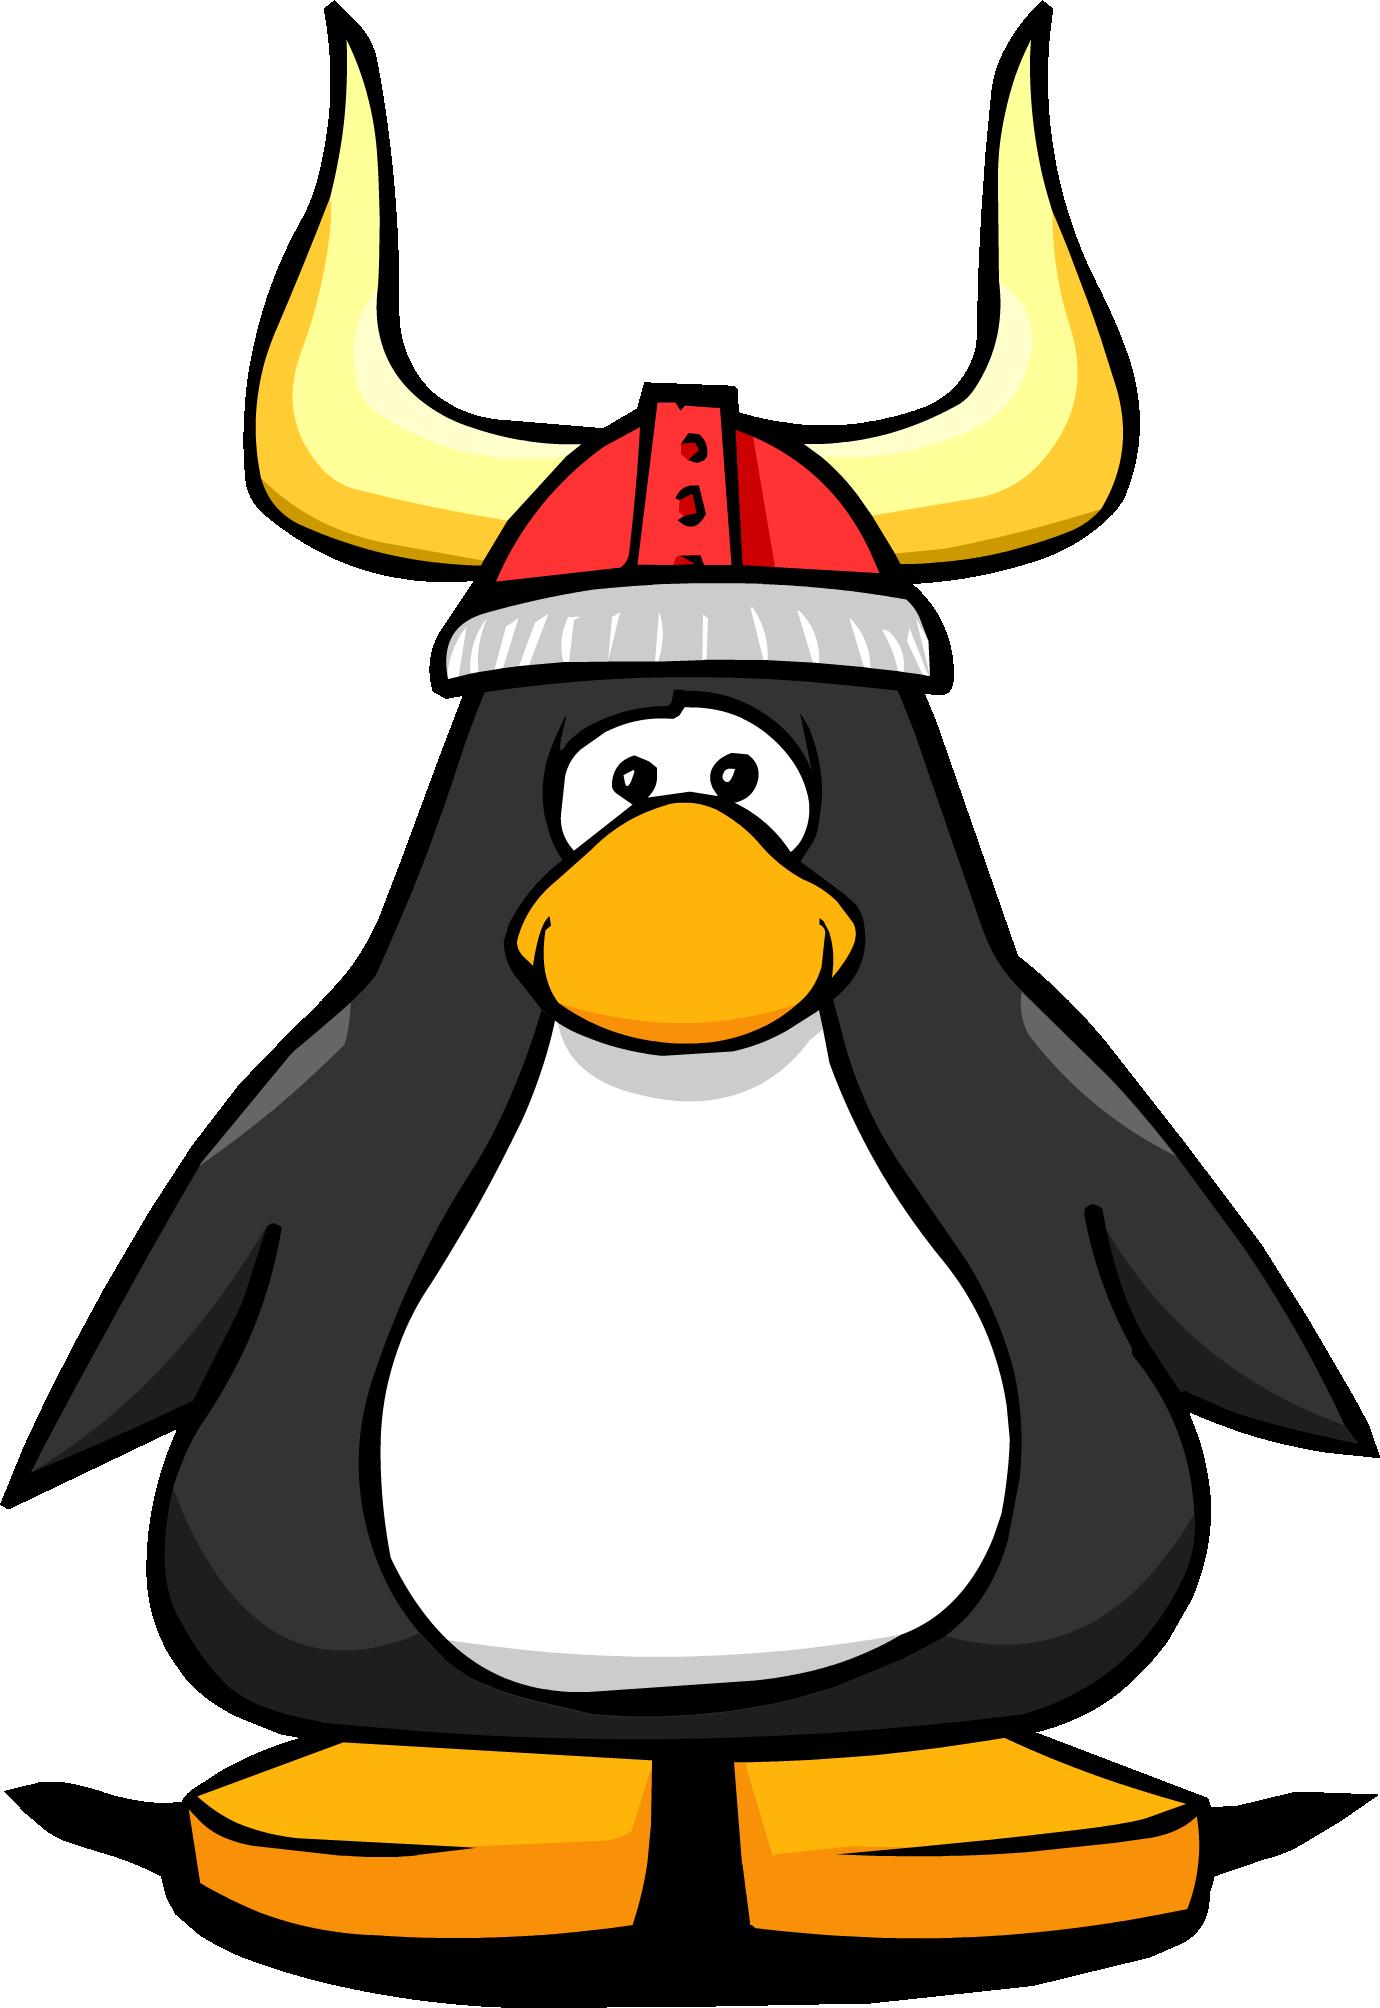 image viking helmet pc png club penguin wiki fandom powered